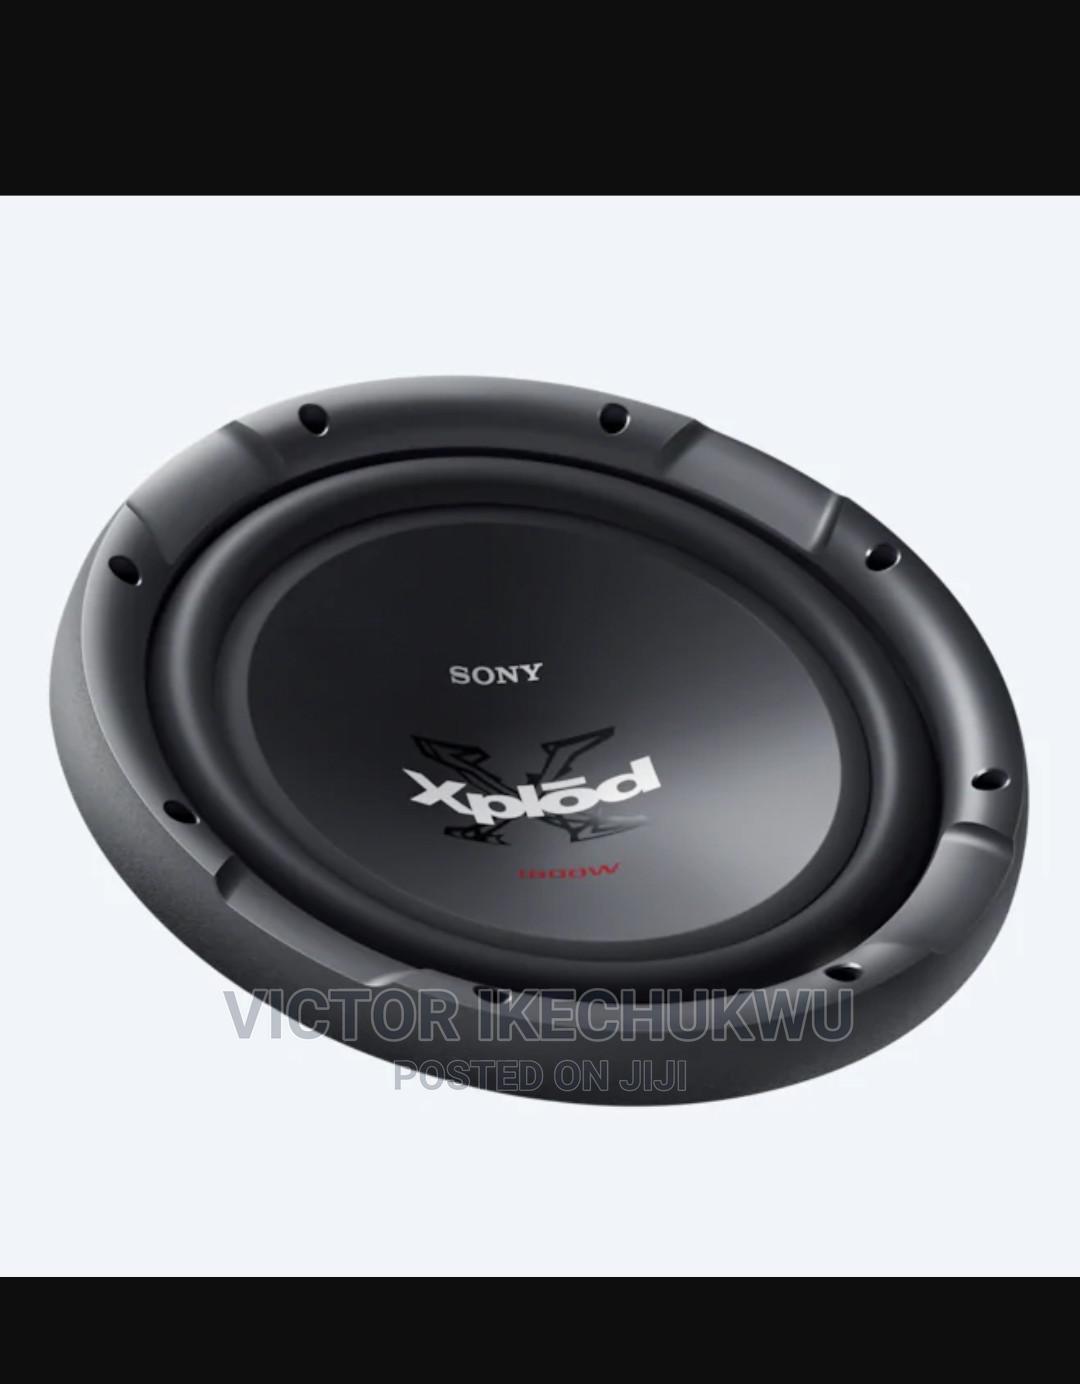 Sony Xplod (XS-NW1201) Car Audio Subwoofer Naked Speaker